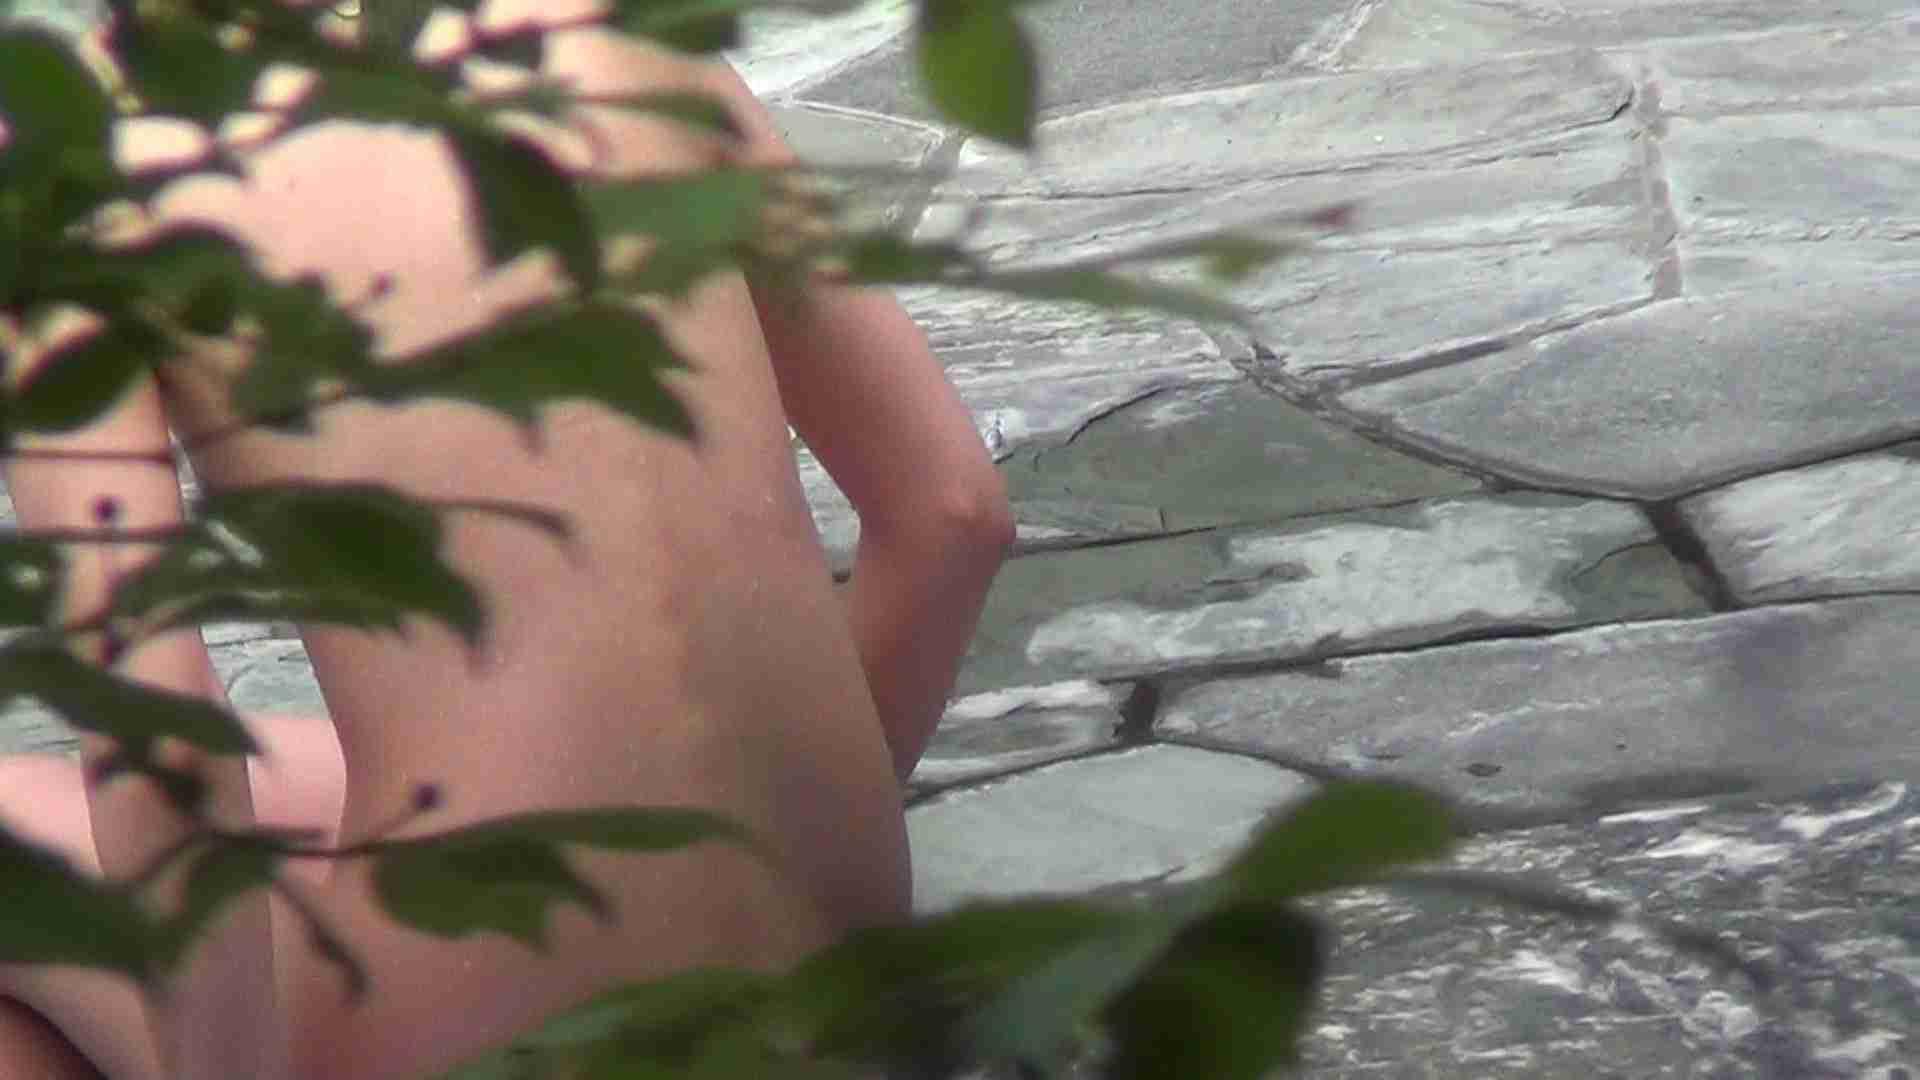 Vol.30 品のある美女 タオルと葉が憎い 高画質動画 オマンコ動画キャプチャ 78画像 63